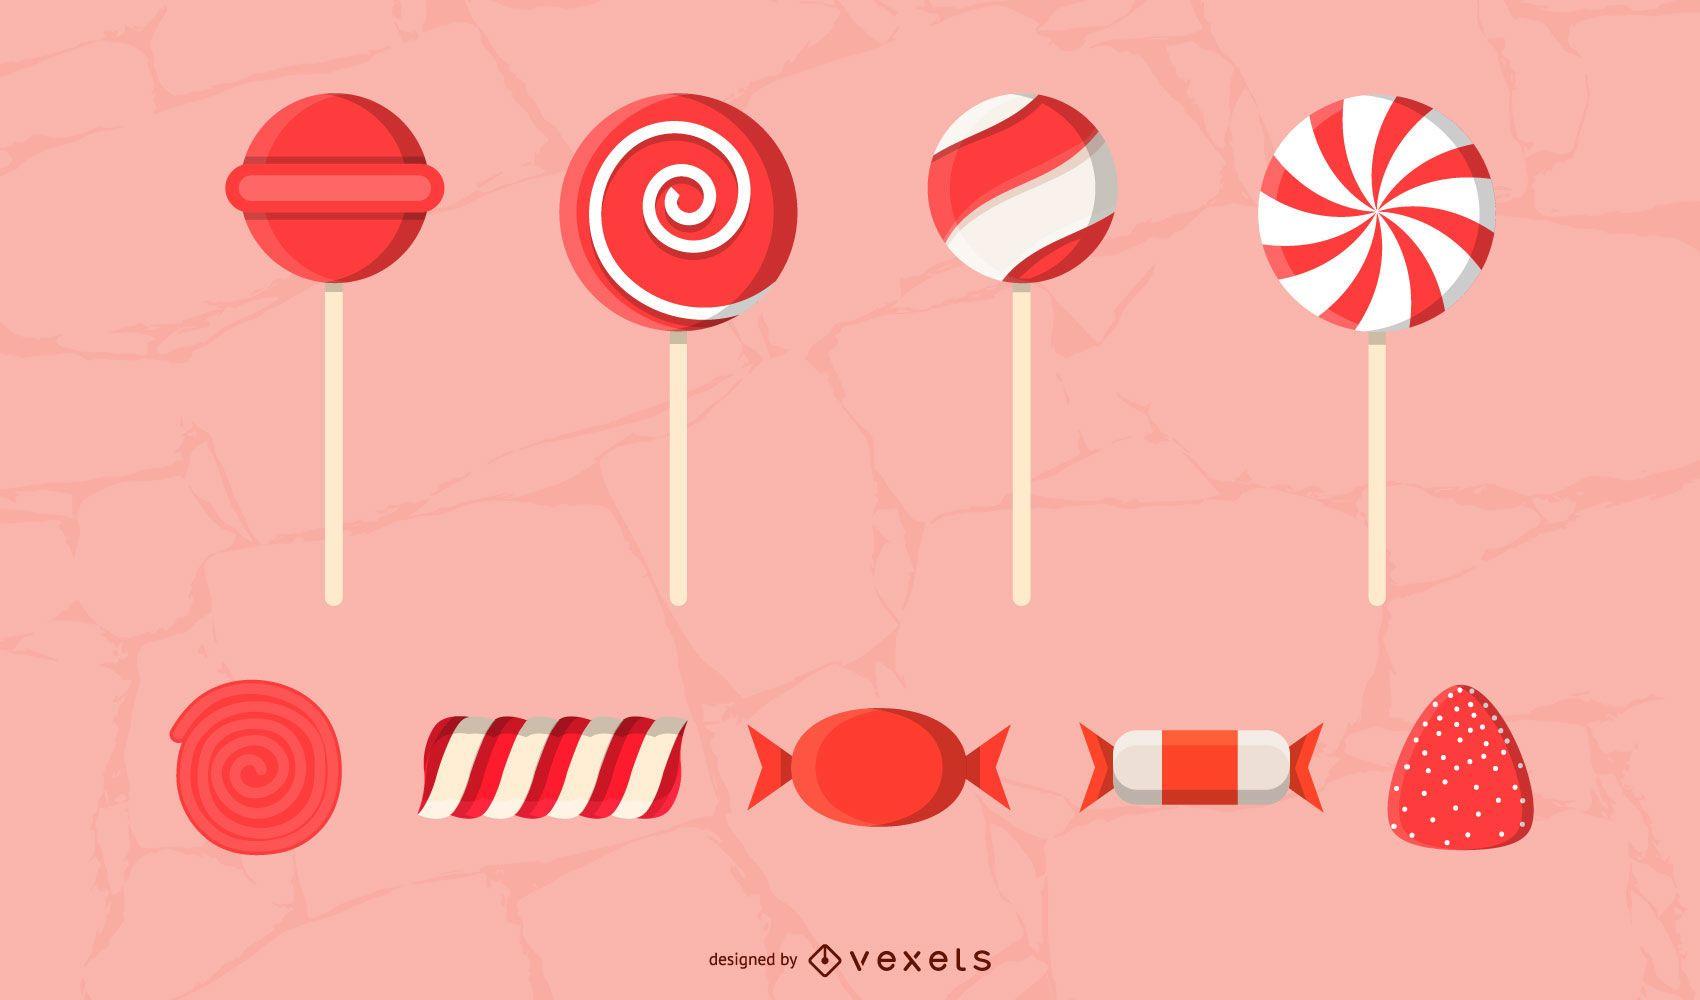 Paquete de dulces rojos